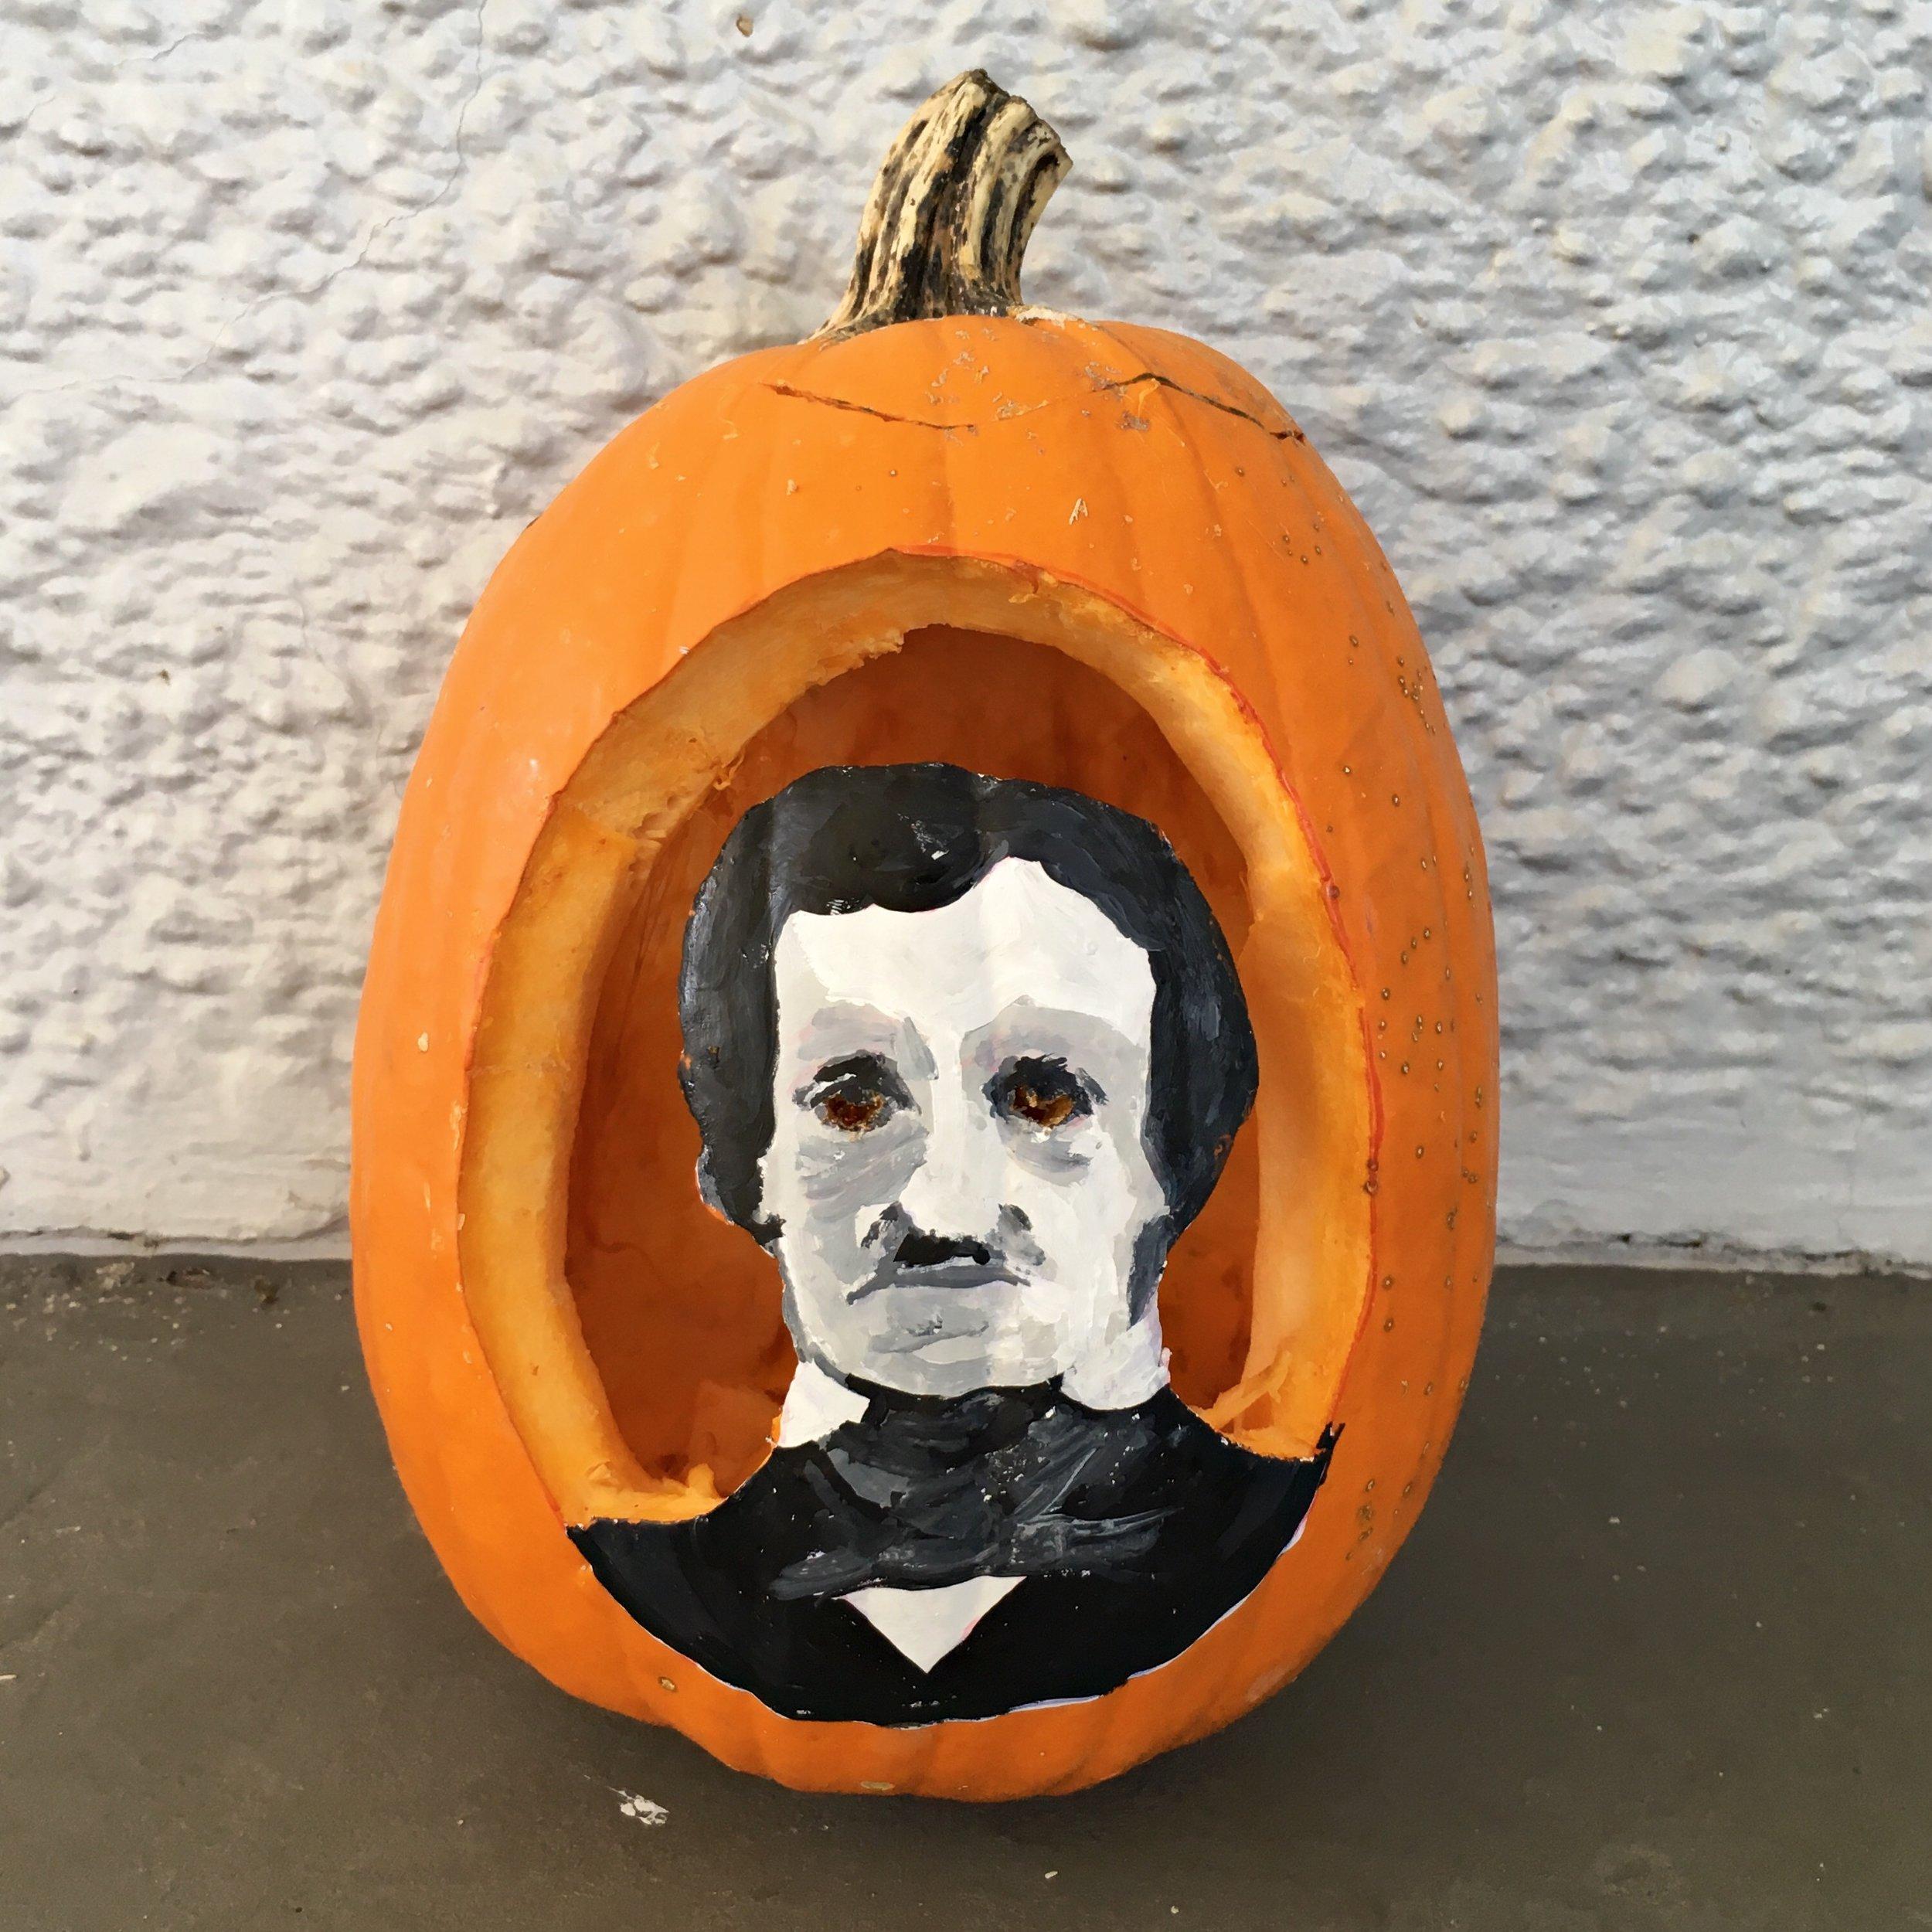 crystal moody | Monday Mourning: Edgar Allan Poe